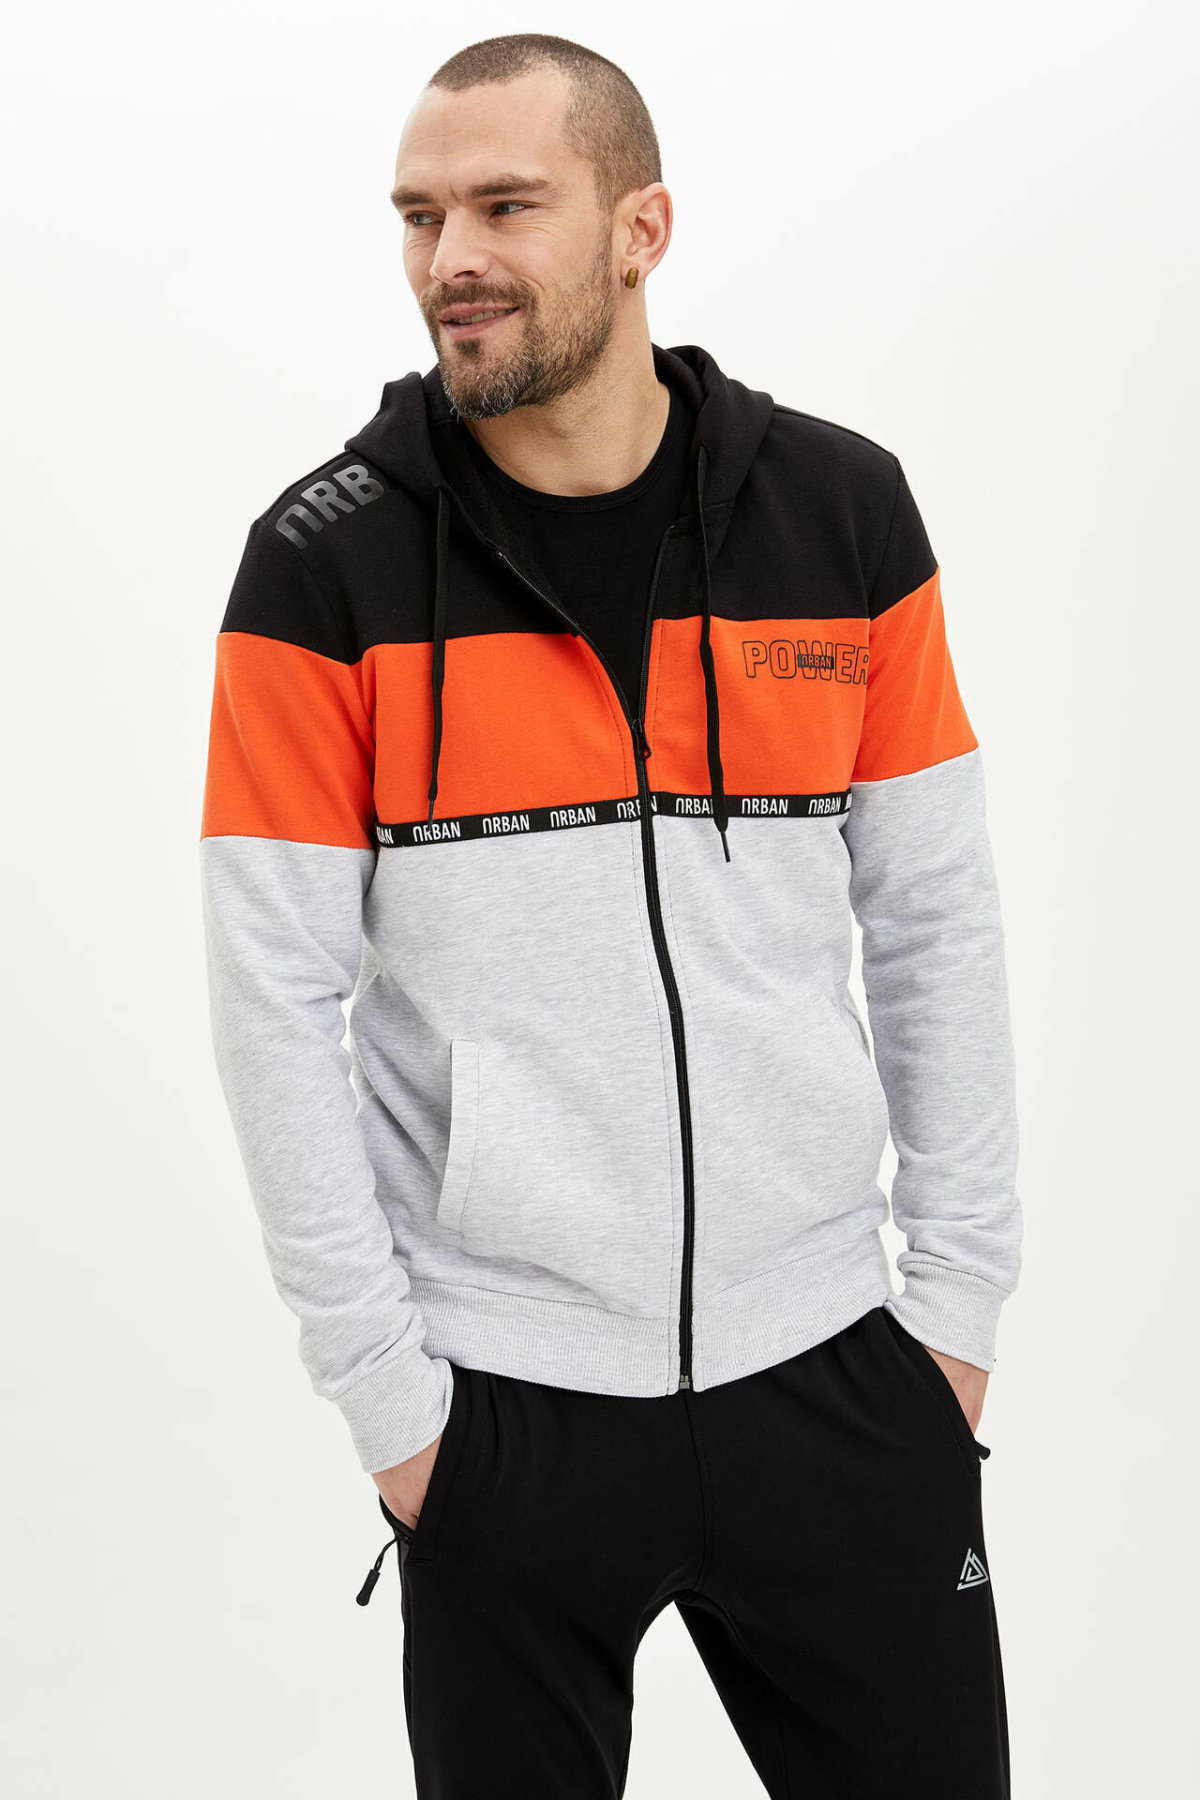 DeFacto Man's Knitted Tops Men's Striped Top Coats Men's Hooded Sports Coats Men's Spring Outwear Coats-N2960AZ20SP